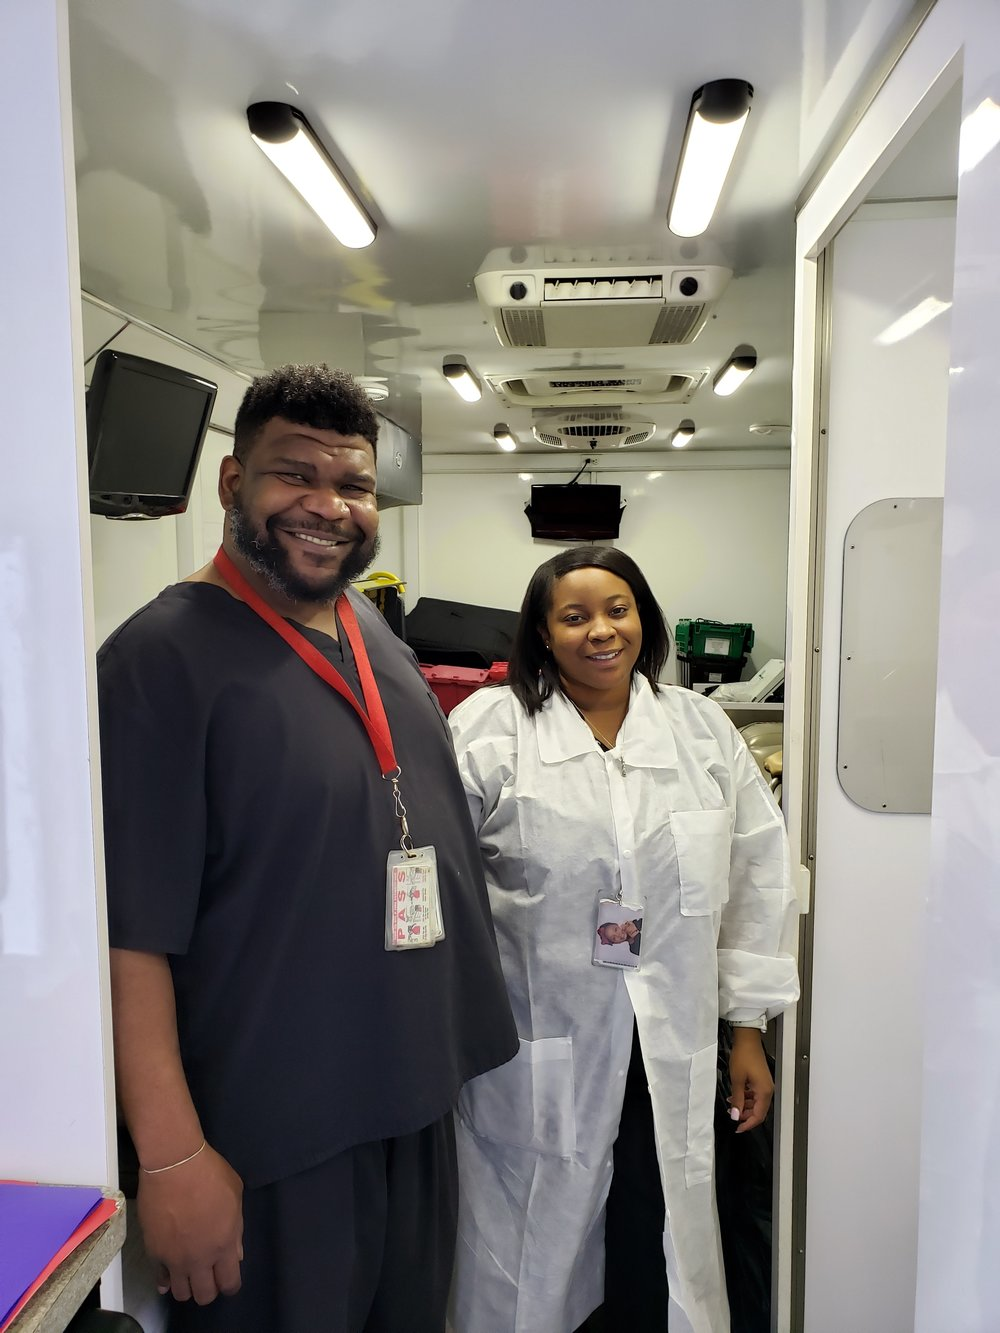 GiveBack-Carter-Team-Platelets-Bus.jpg